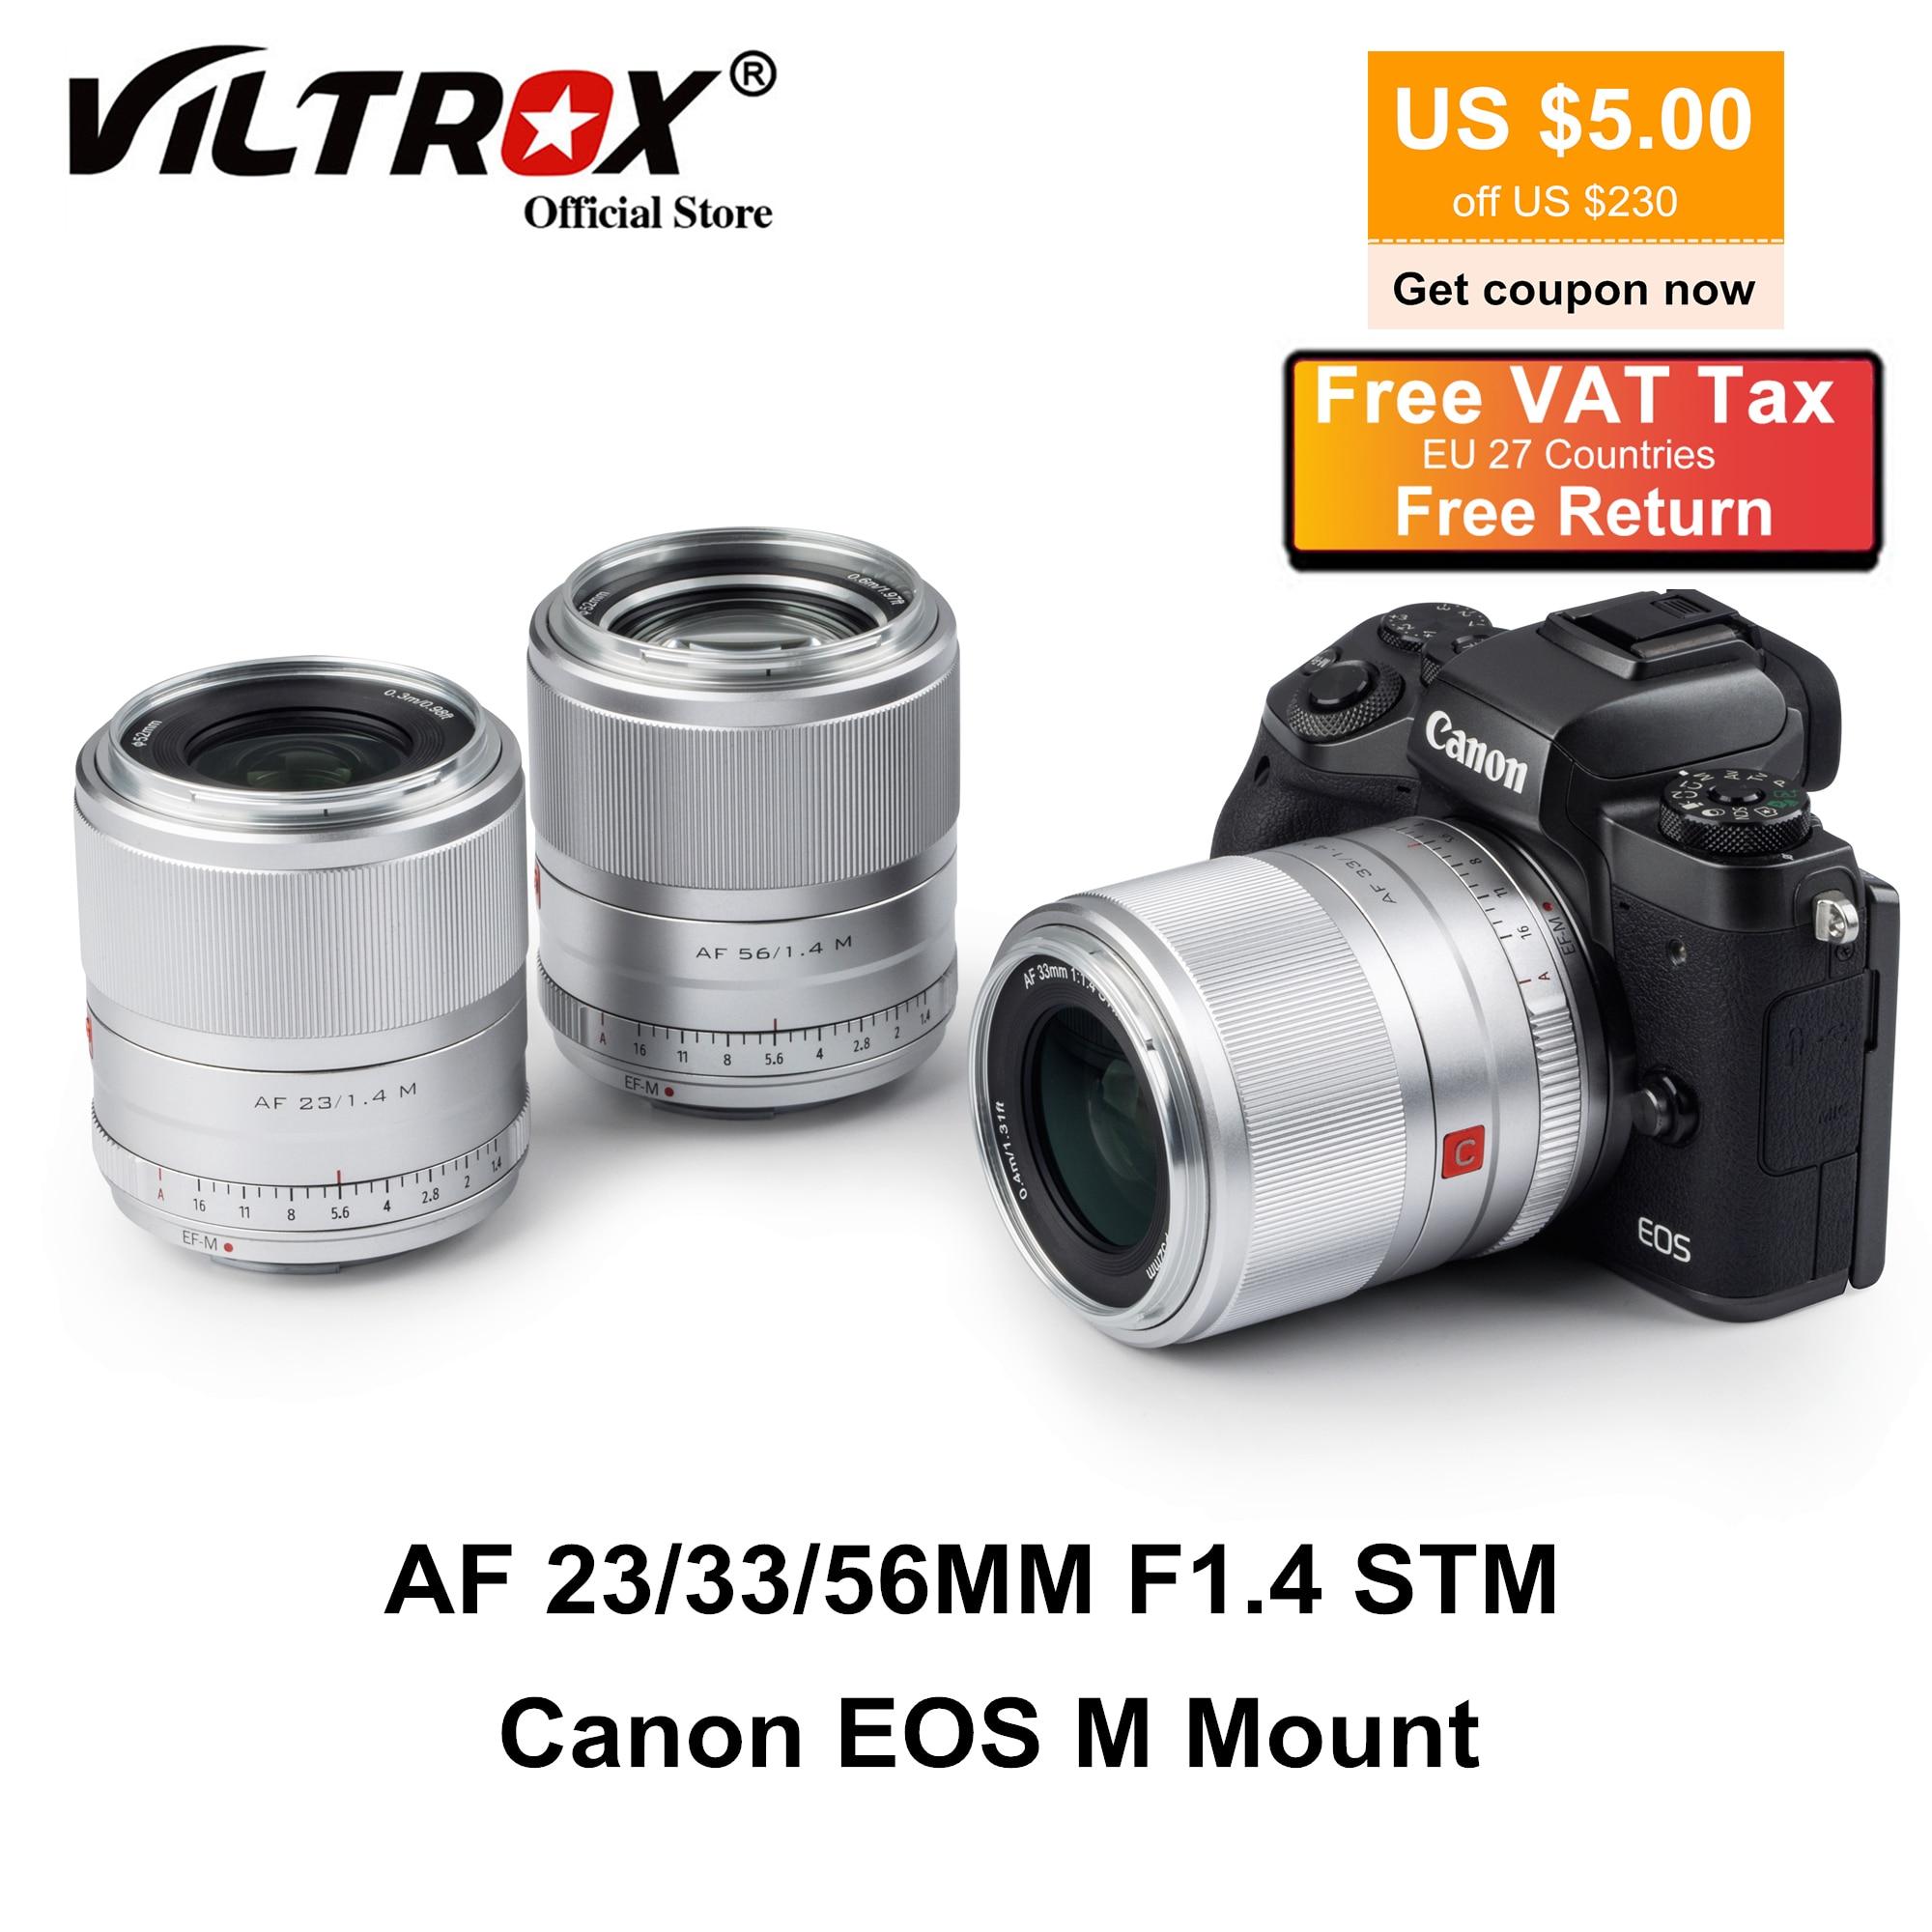 Viltrox 23/33/56 مللي متر F1.4 EF-M عدسة السيارات التركيز صورة رئيس عدسة APS-C لكانون EOS م عدسة الكاميرا M5 M10 M100 M200 M50 M6II